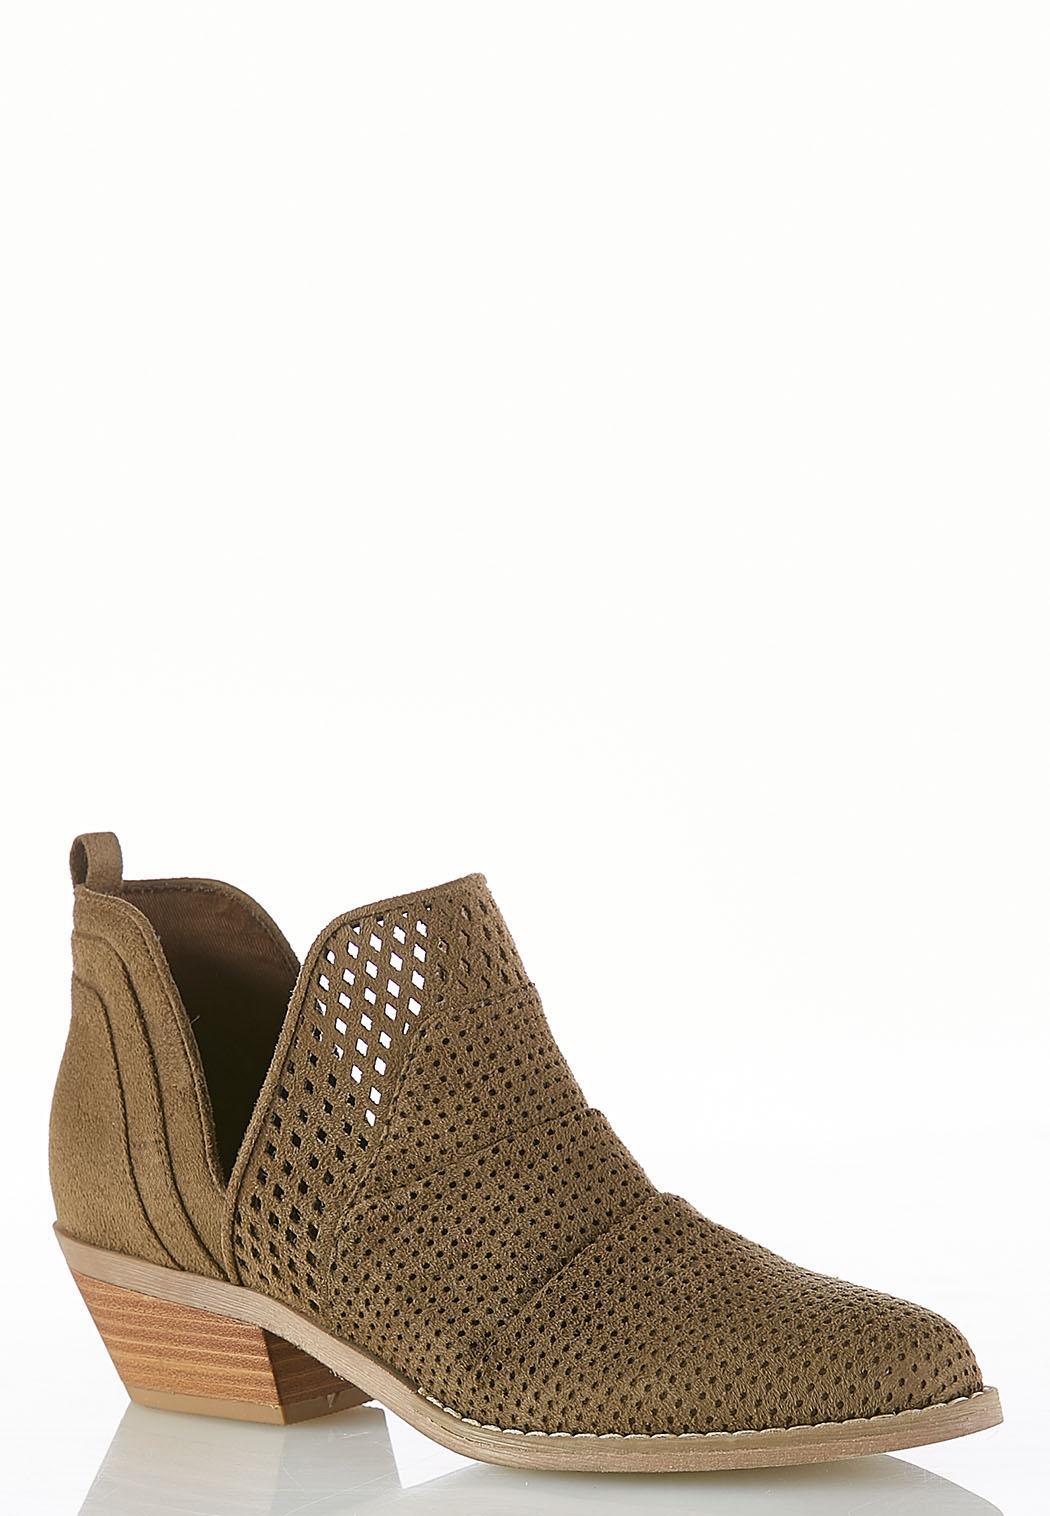 a6a6ffbe7e50 Women s Boots